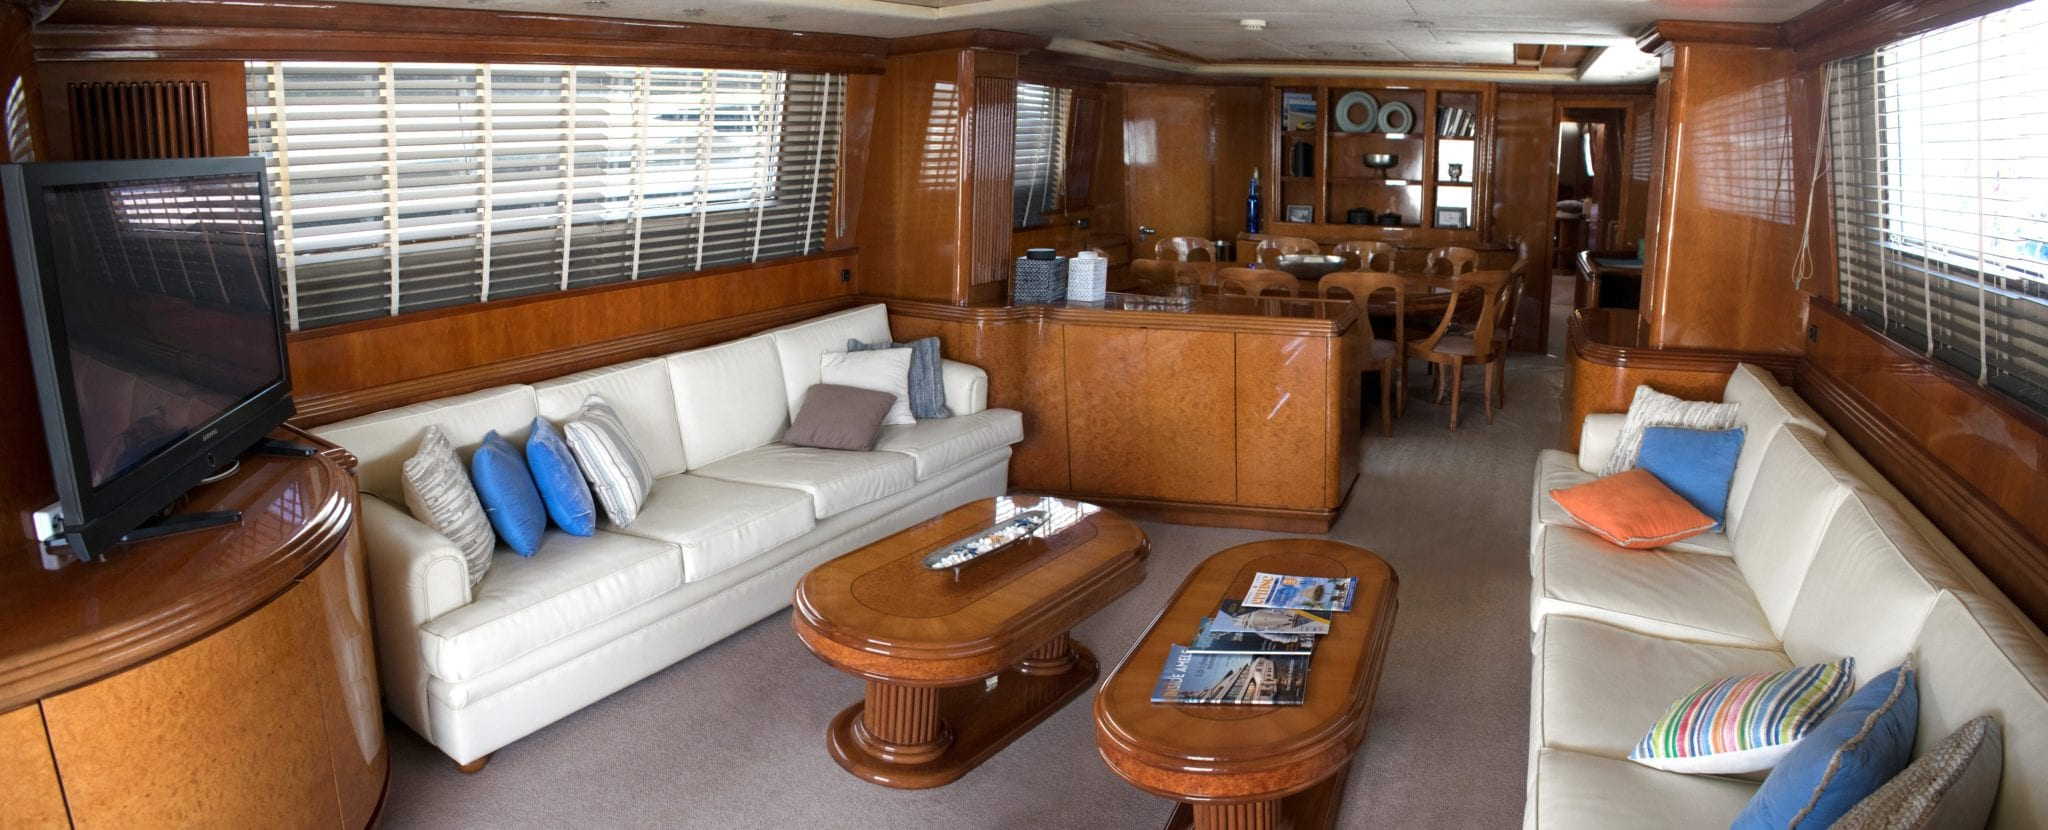 monte carlo falcon motor yacht salon (2) min -  Valef Yachts Chartering - 3134